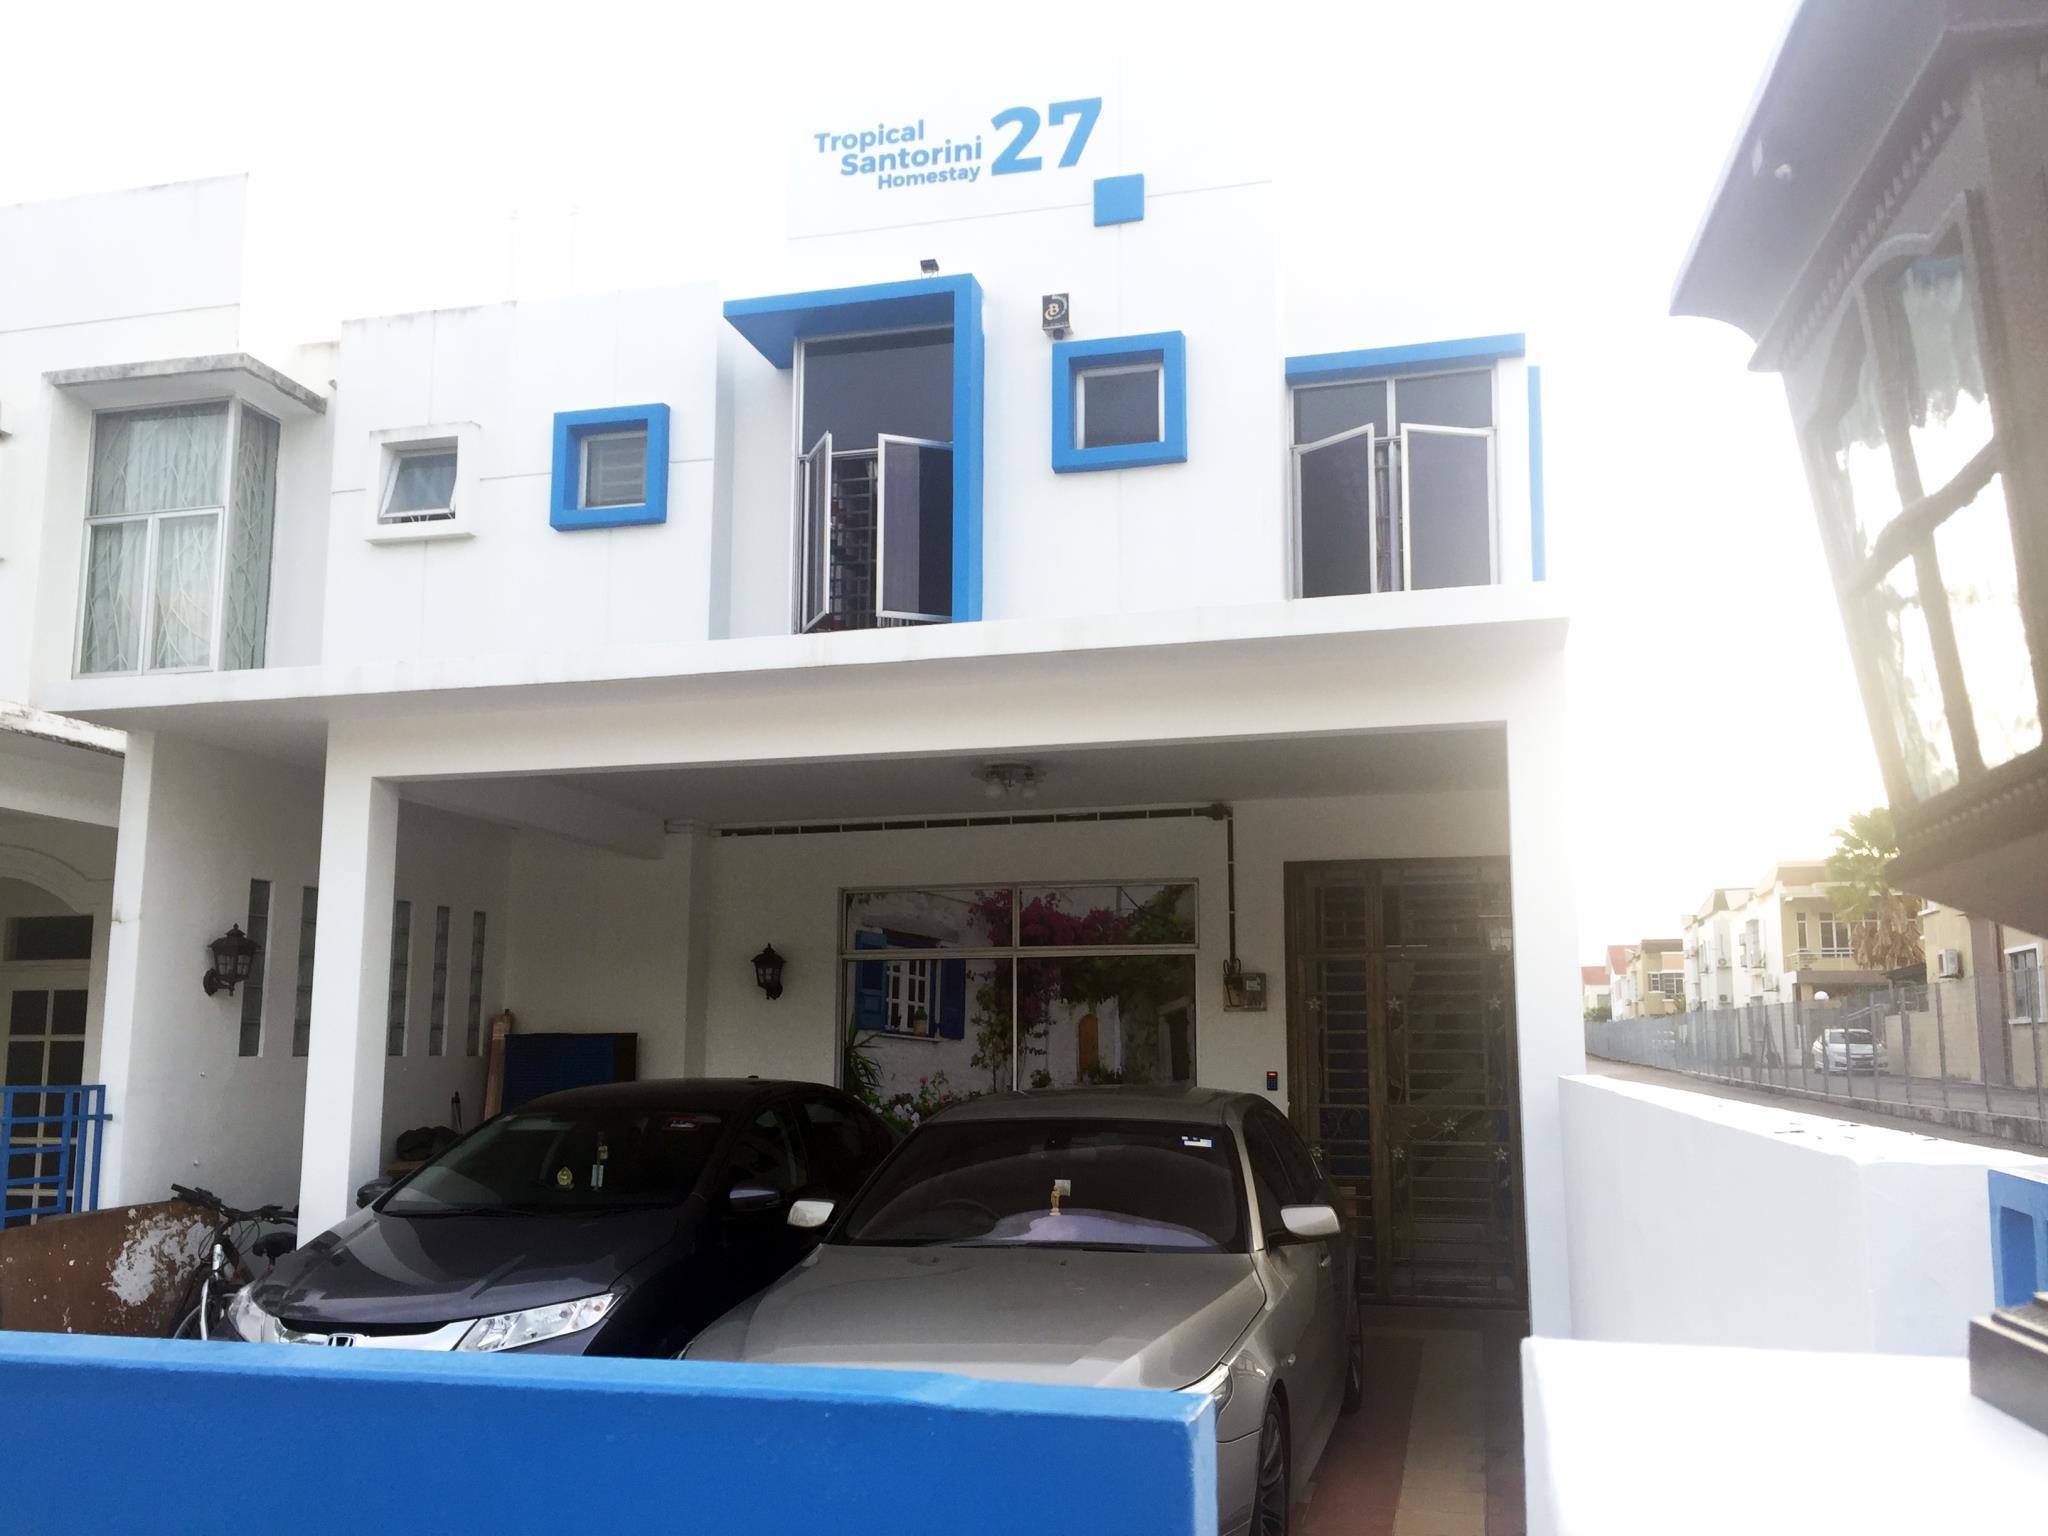 Tropical Santorini Guest House In Johor Bahru, Malaysia ...